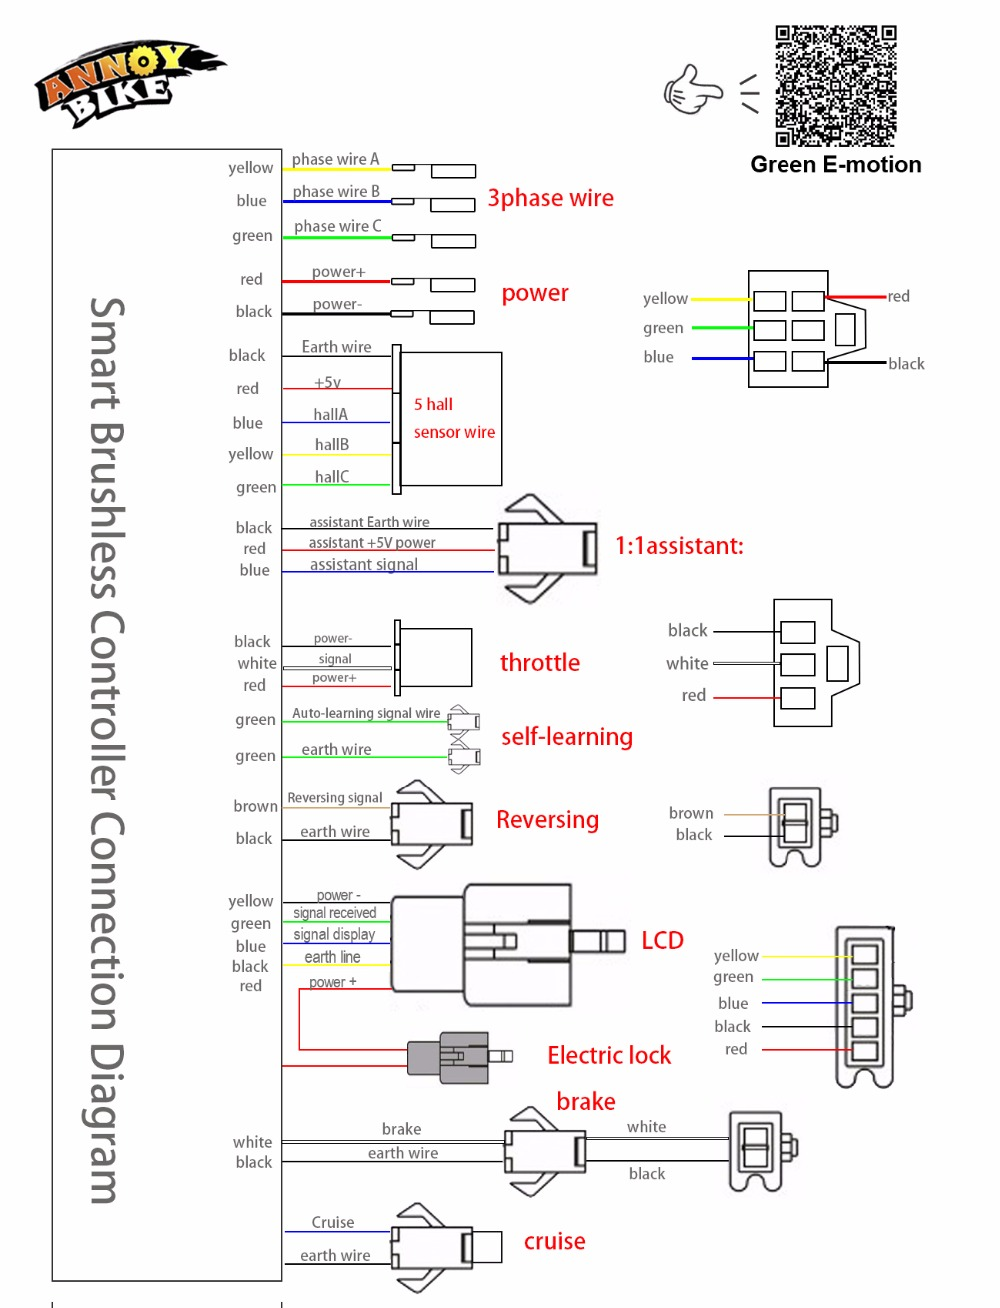 Circuit Diagram Of Electric Bike - Read All Wiring Diagram